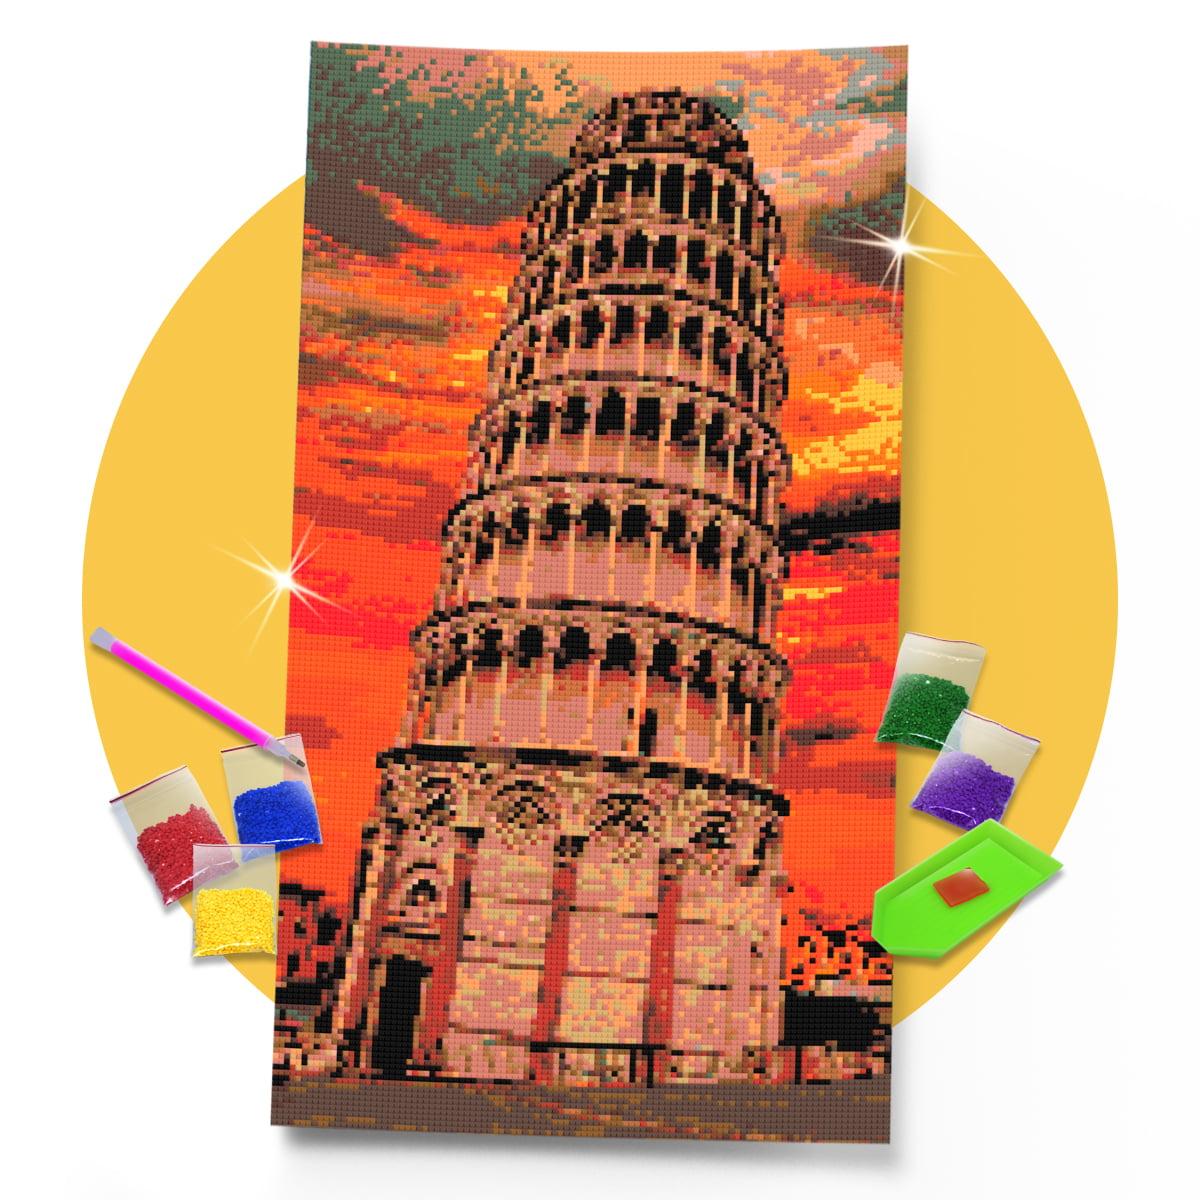 Kit Pintura com Diamantes | Tela Torre de Pisa - 30 x 57 cm - Diamante Redondo | Diamond Painting 5D DIY